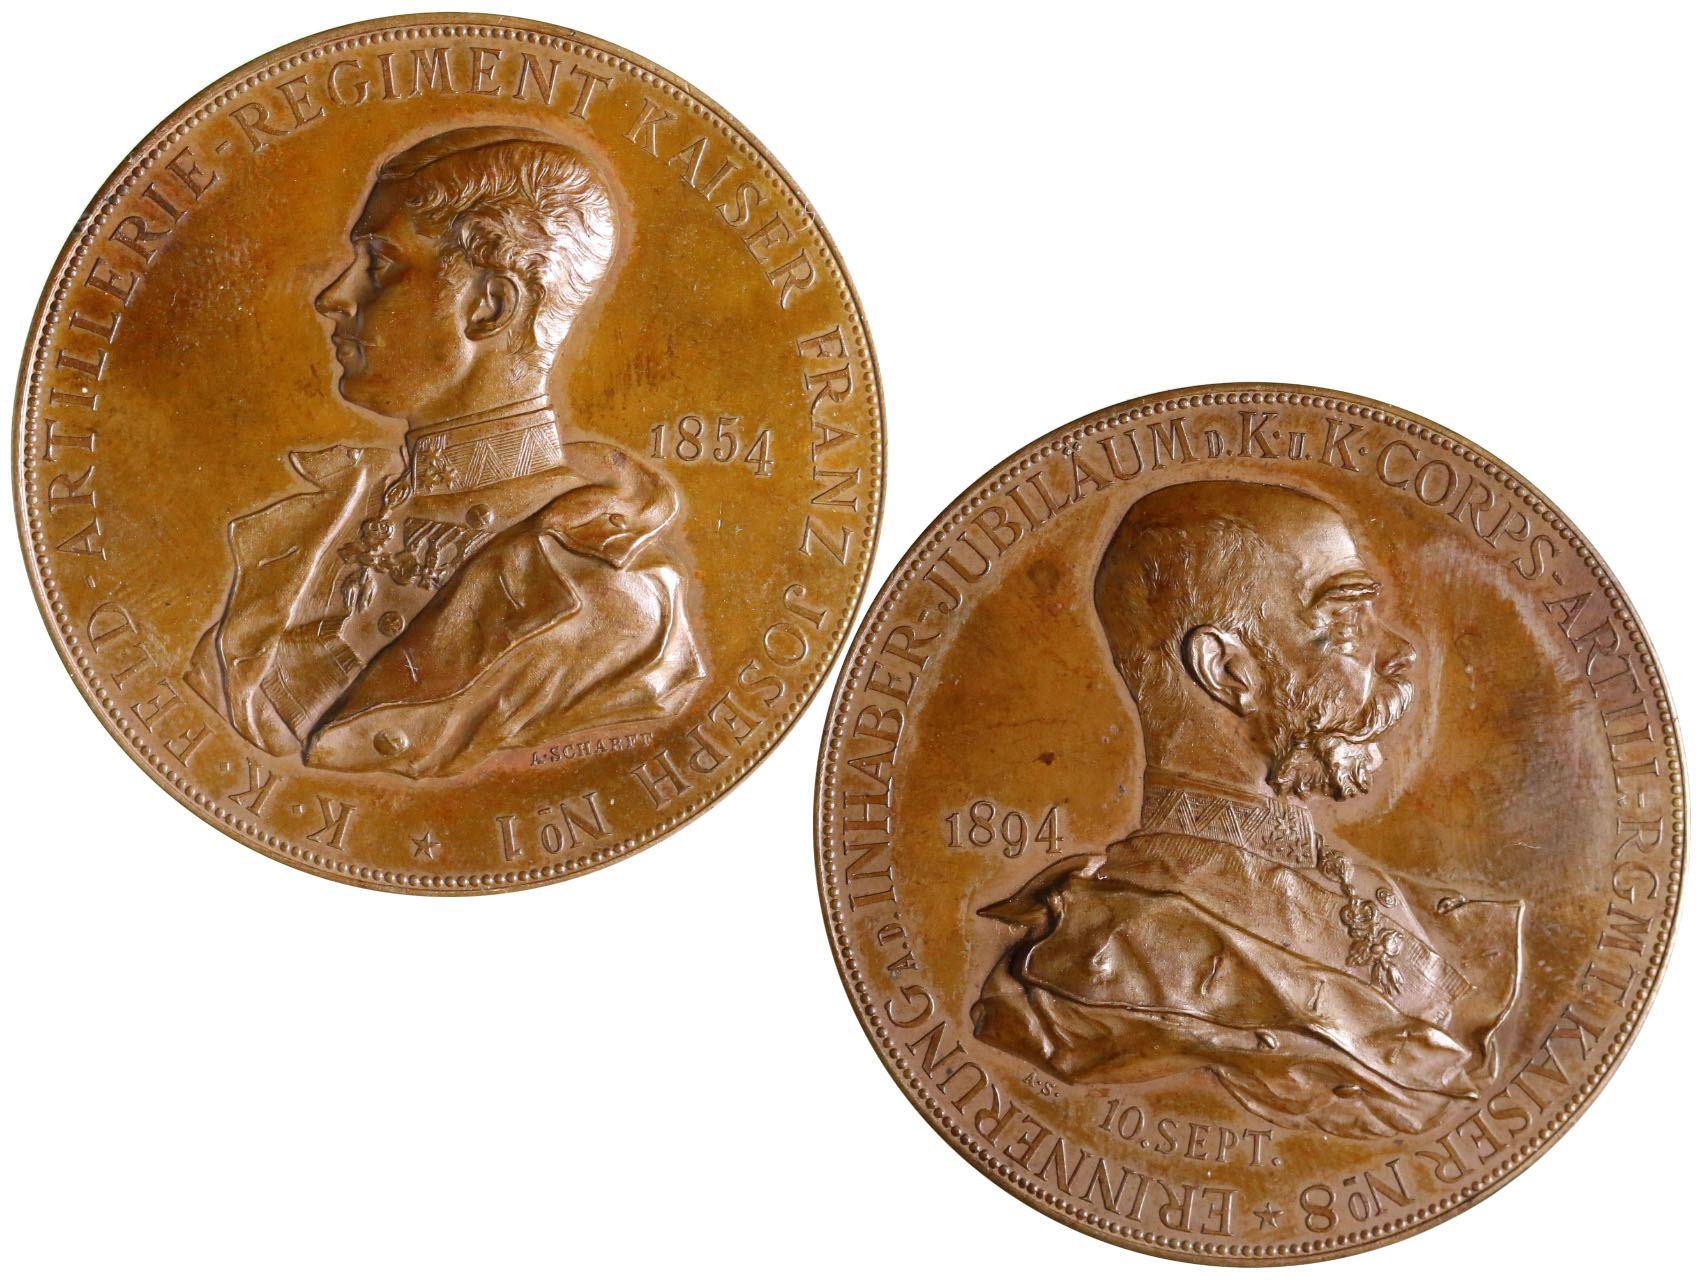 Osobnosti - František Josef I. 1830-1916, AE medaile, F.J.I. 1854 jako majitel děl. pluku č.1 / 1894 jako majitel děl. pluku č. 8. Značeno A. Scharff, bronz 39 mm